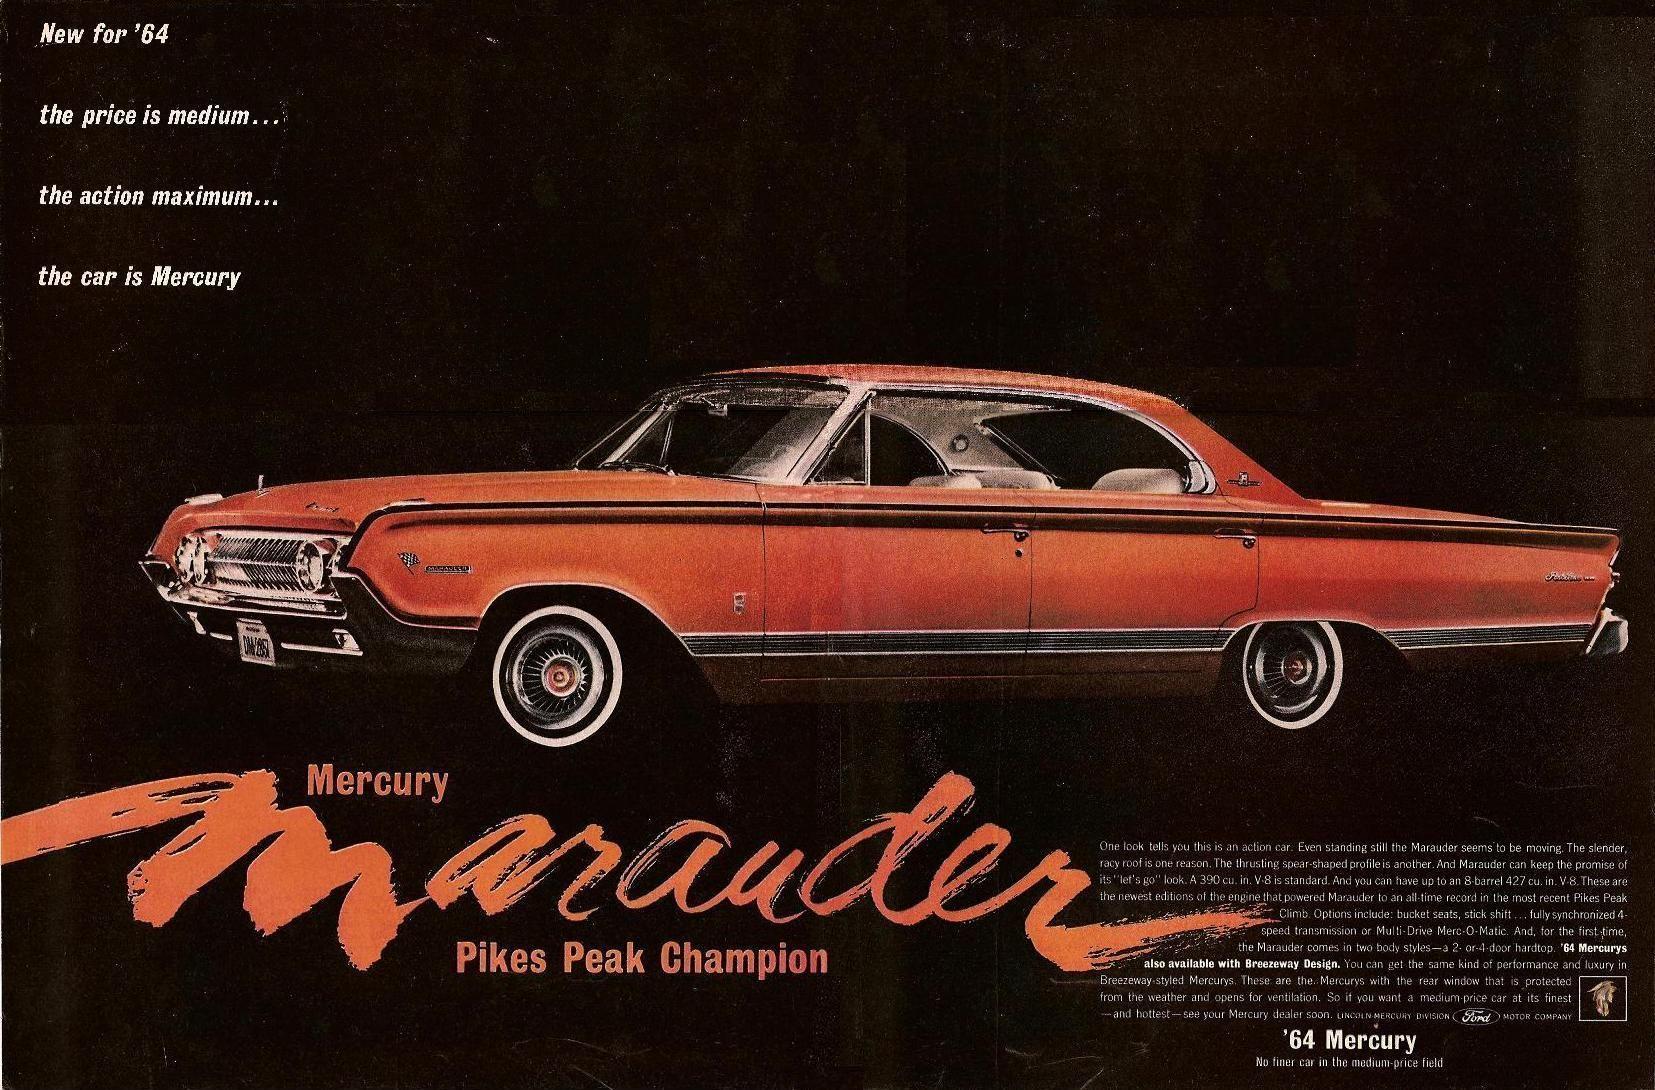 1964 Mercury Marauder Mercury Cars Mercury Marauder Marauder Vehicle